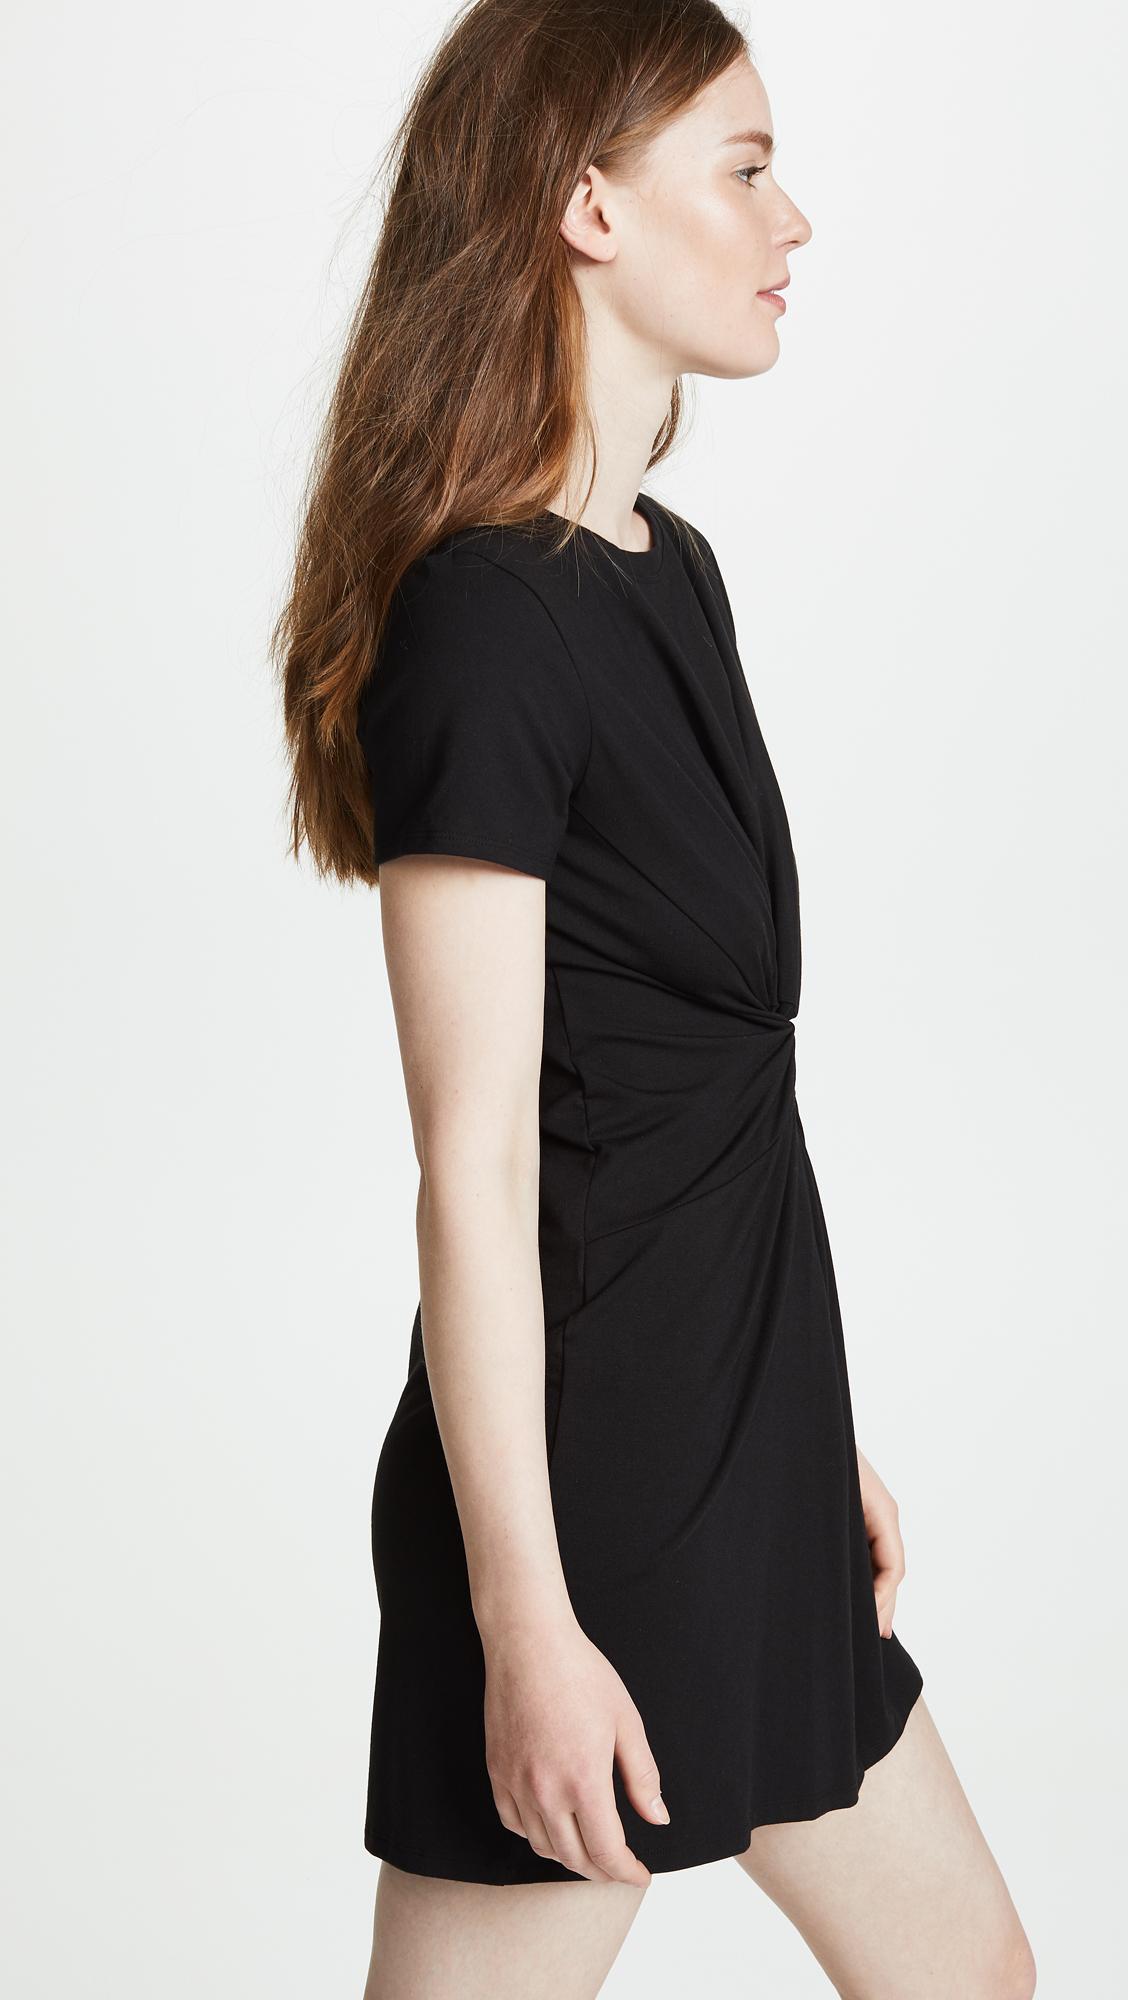 Theory Knot Tee Dress Shopbop Jolie Clothing Georgia Mini